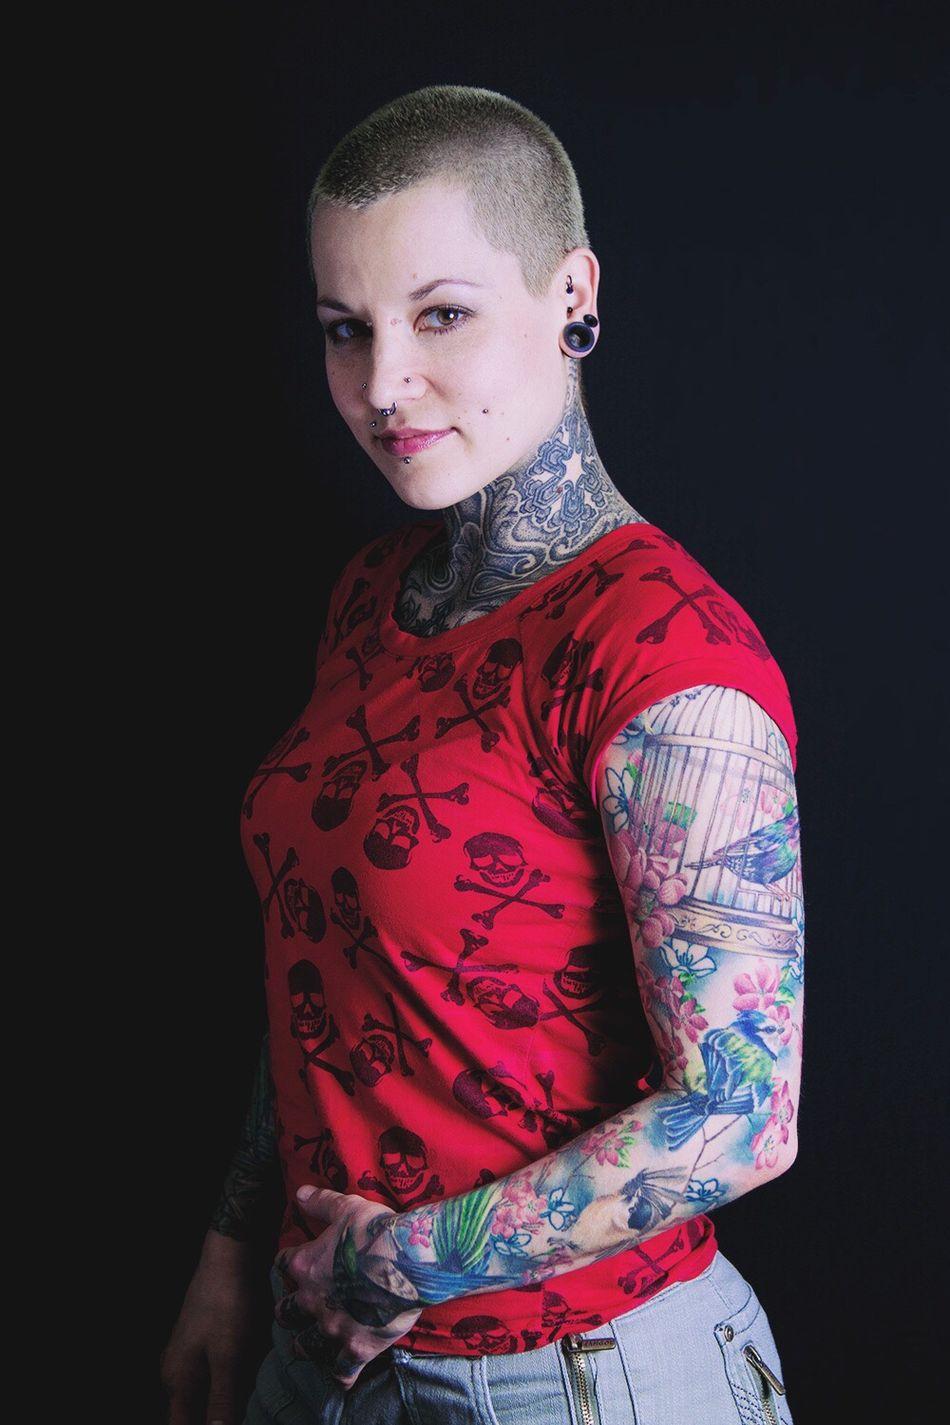 Jackie, tattoo artist, piercer, roller derby player/coach Portrait Of A Woman Tattooed